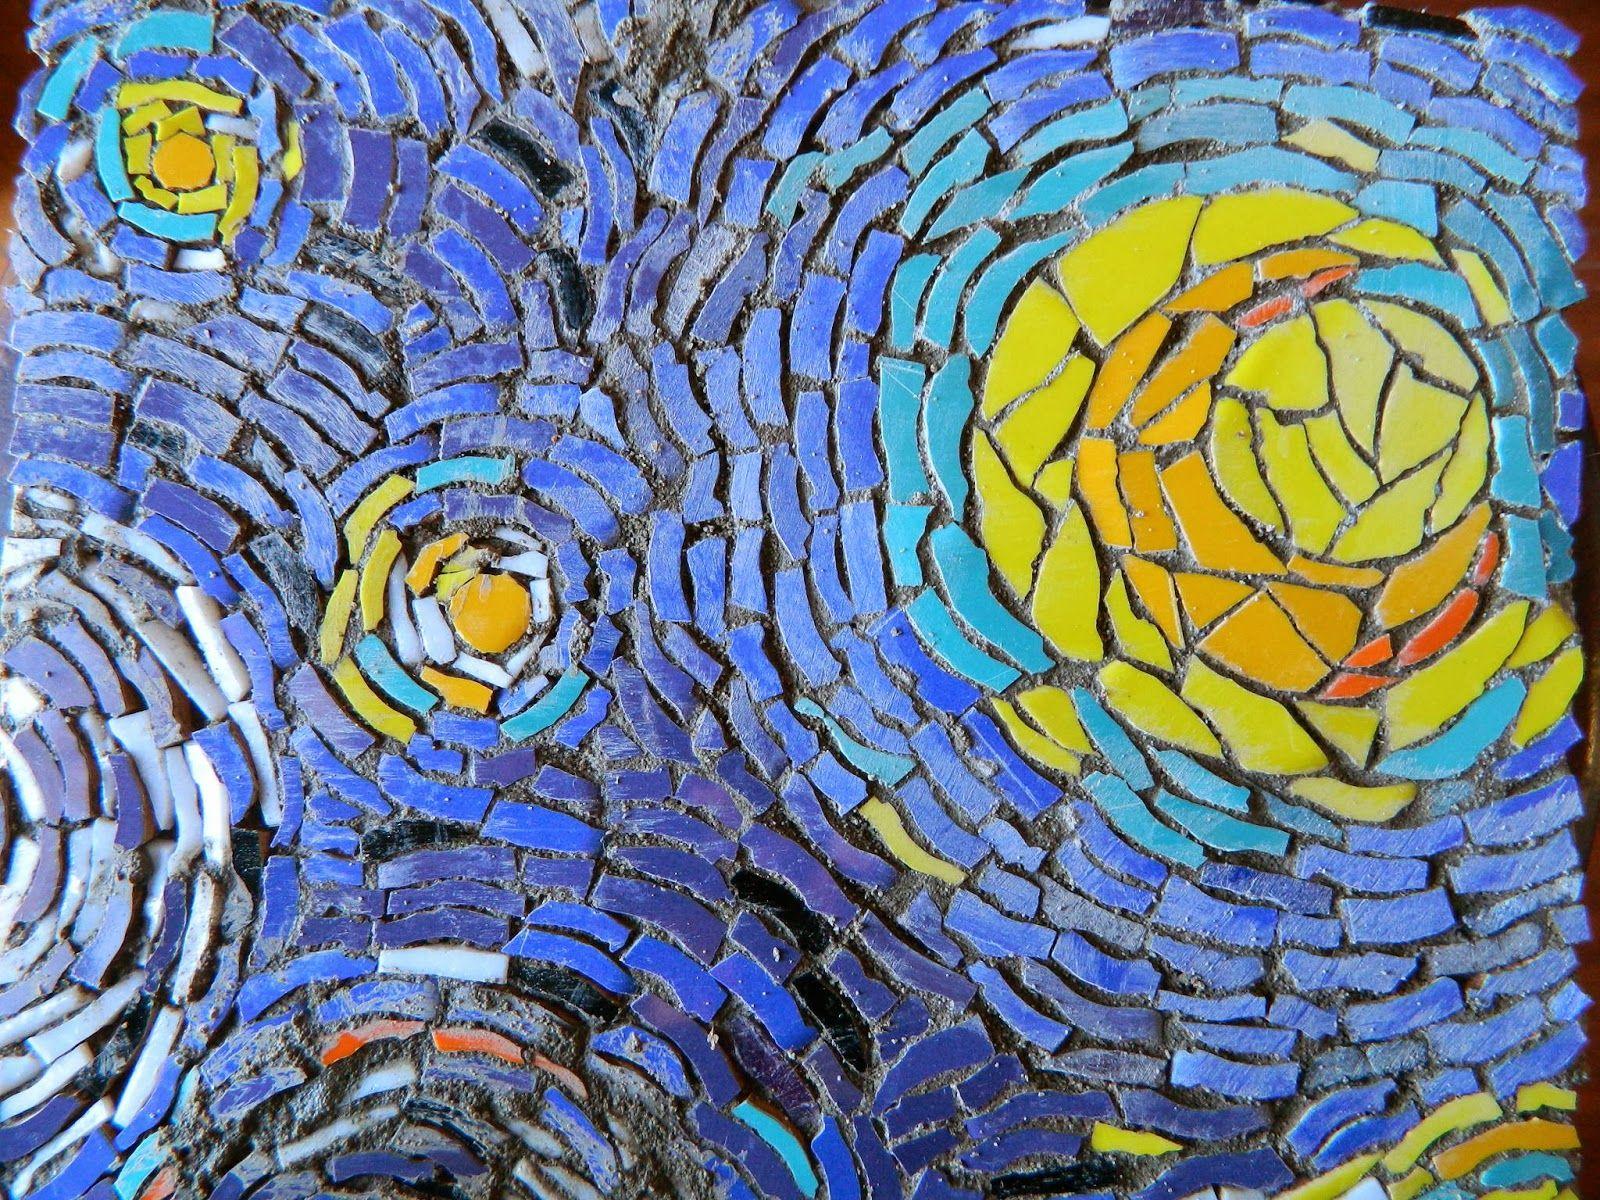 Noche Estrellada Van Gogh Arte En Parte Taller Multiarte Jornada De Mosaico Sobre Malla Mosaic Art Vincent Van Gogh Paintings Painting